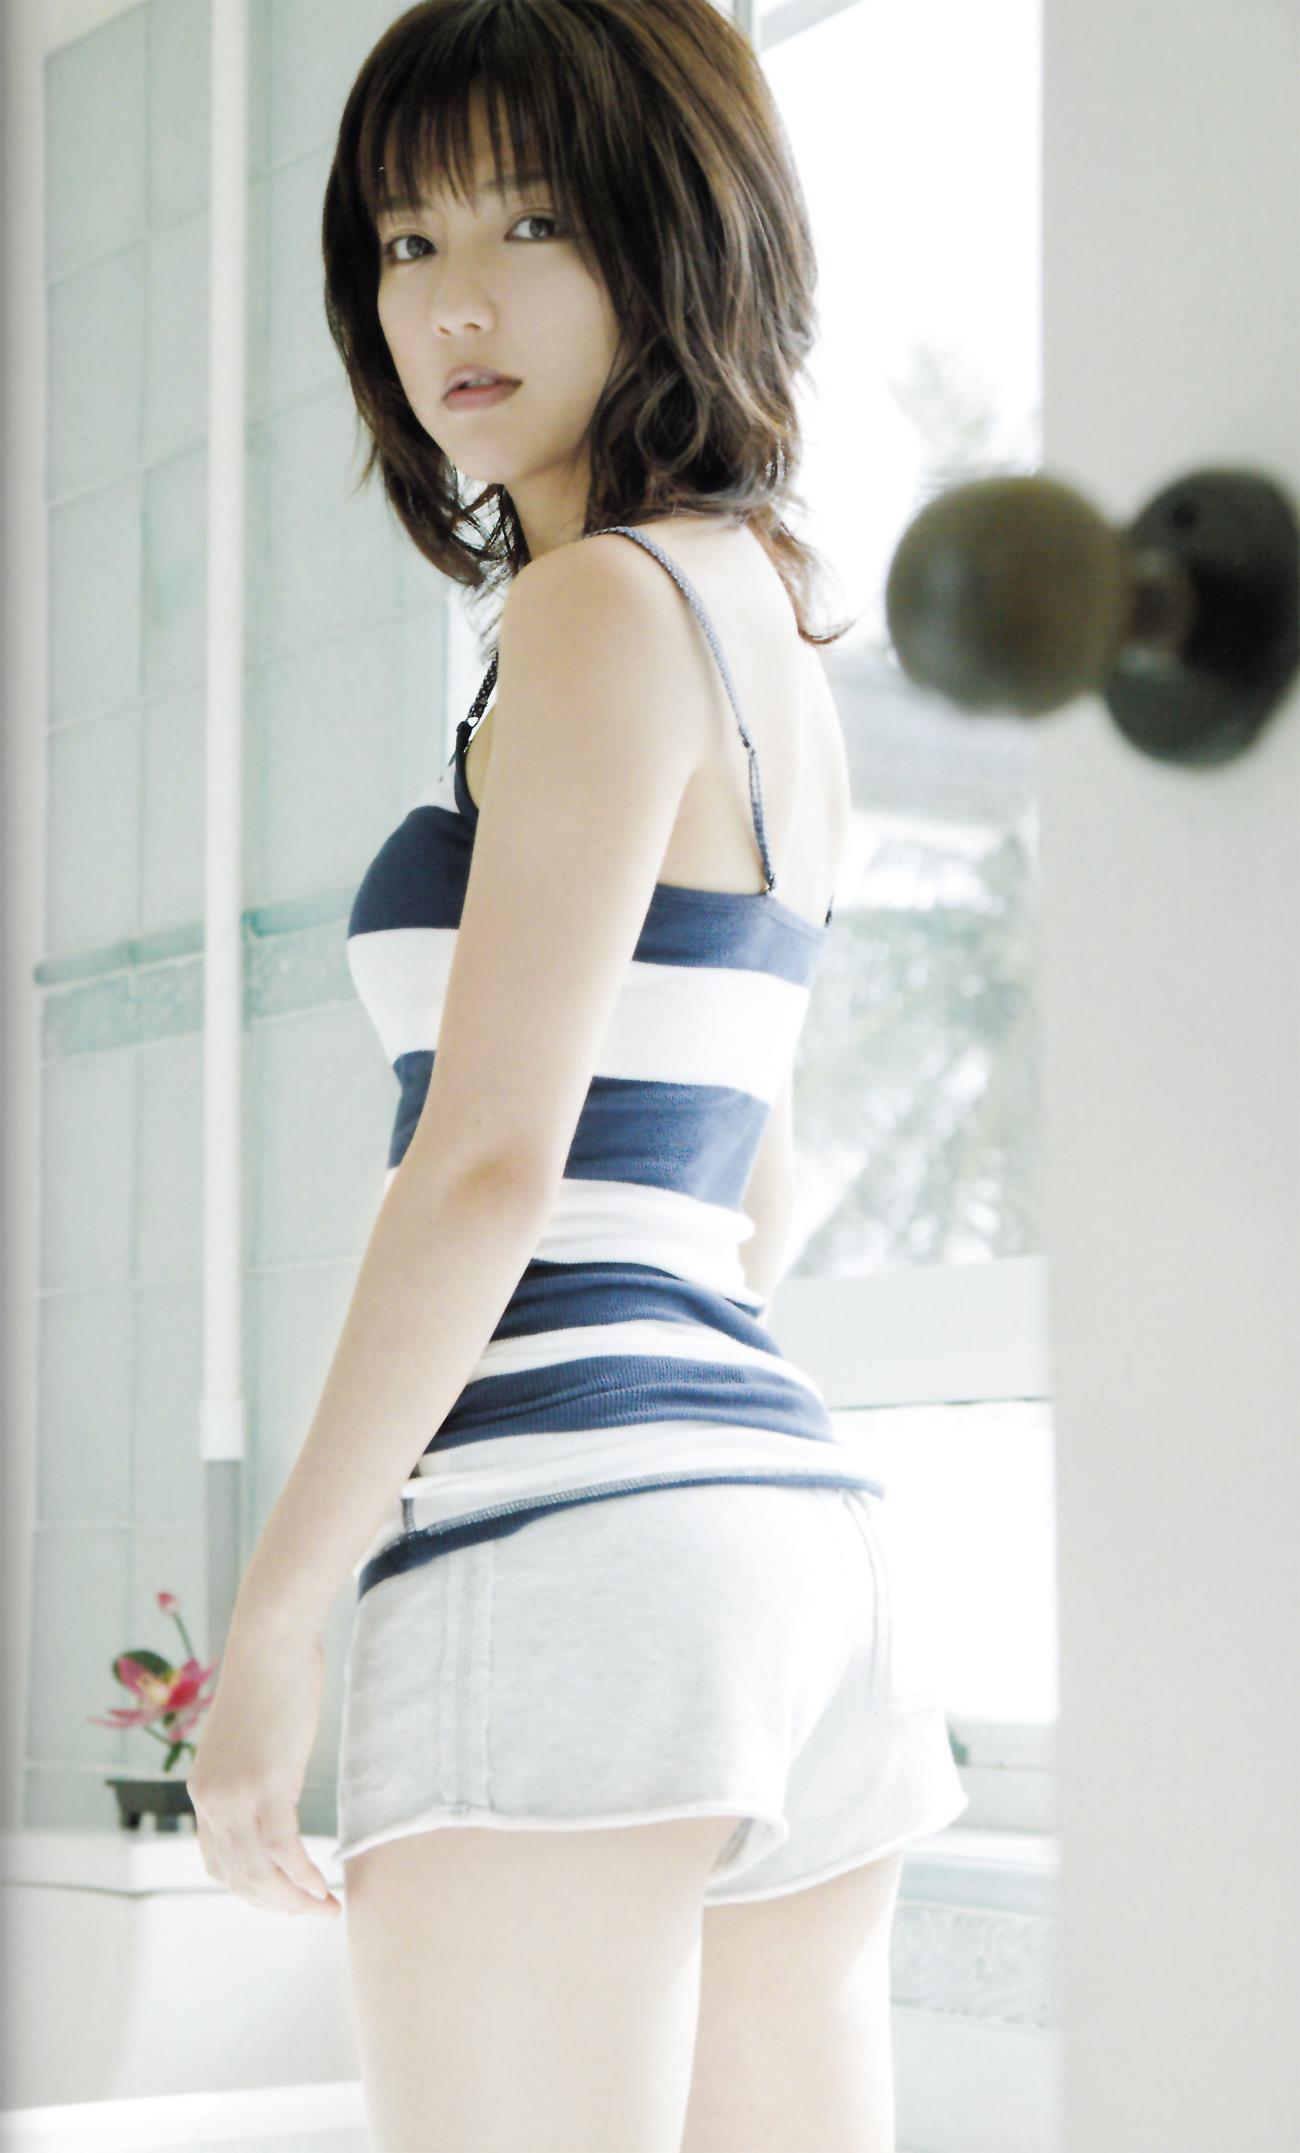 真野恵里菜 エロ画像 81